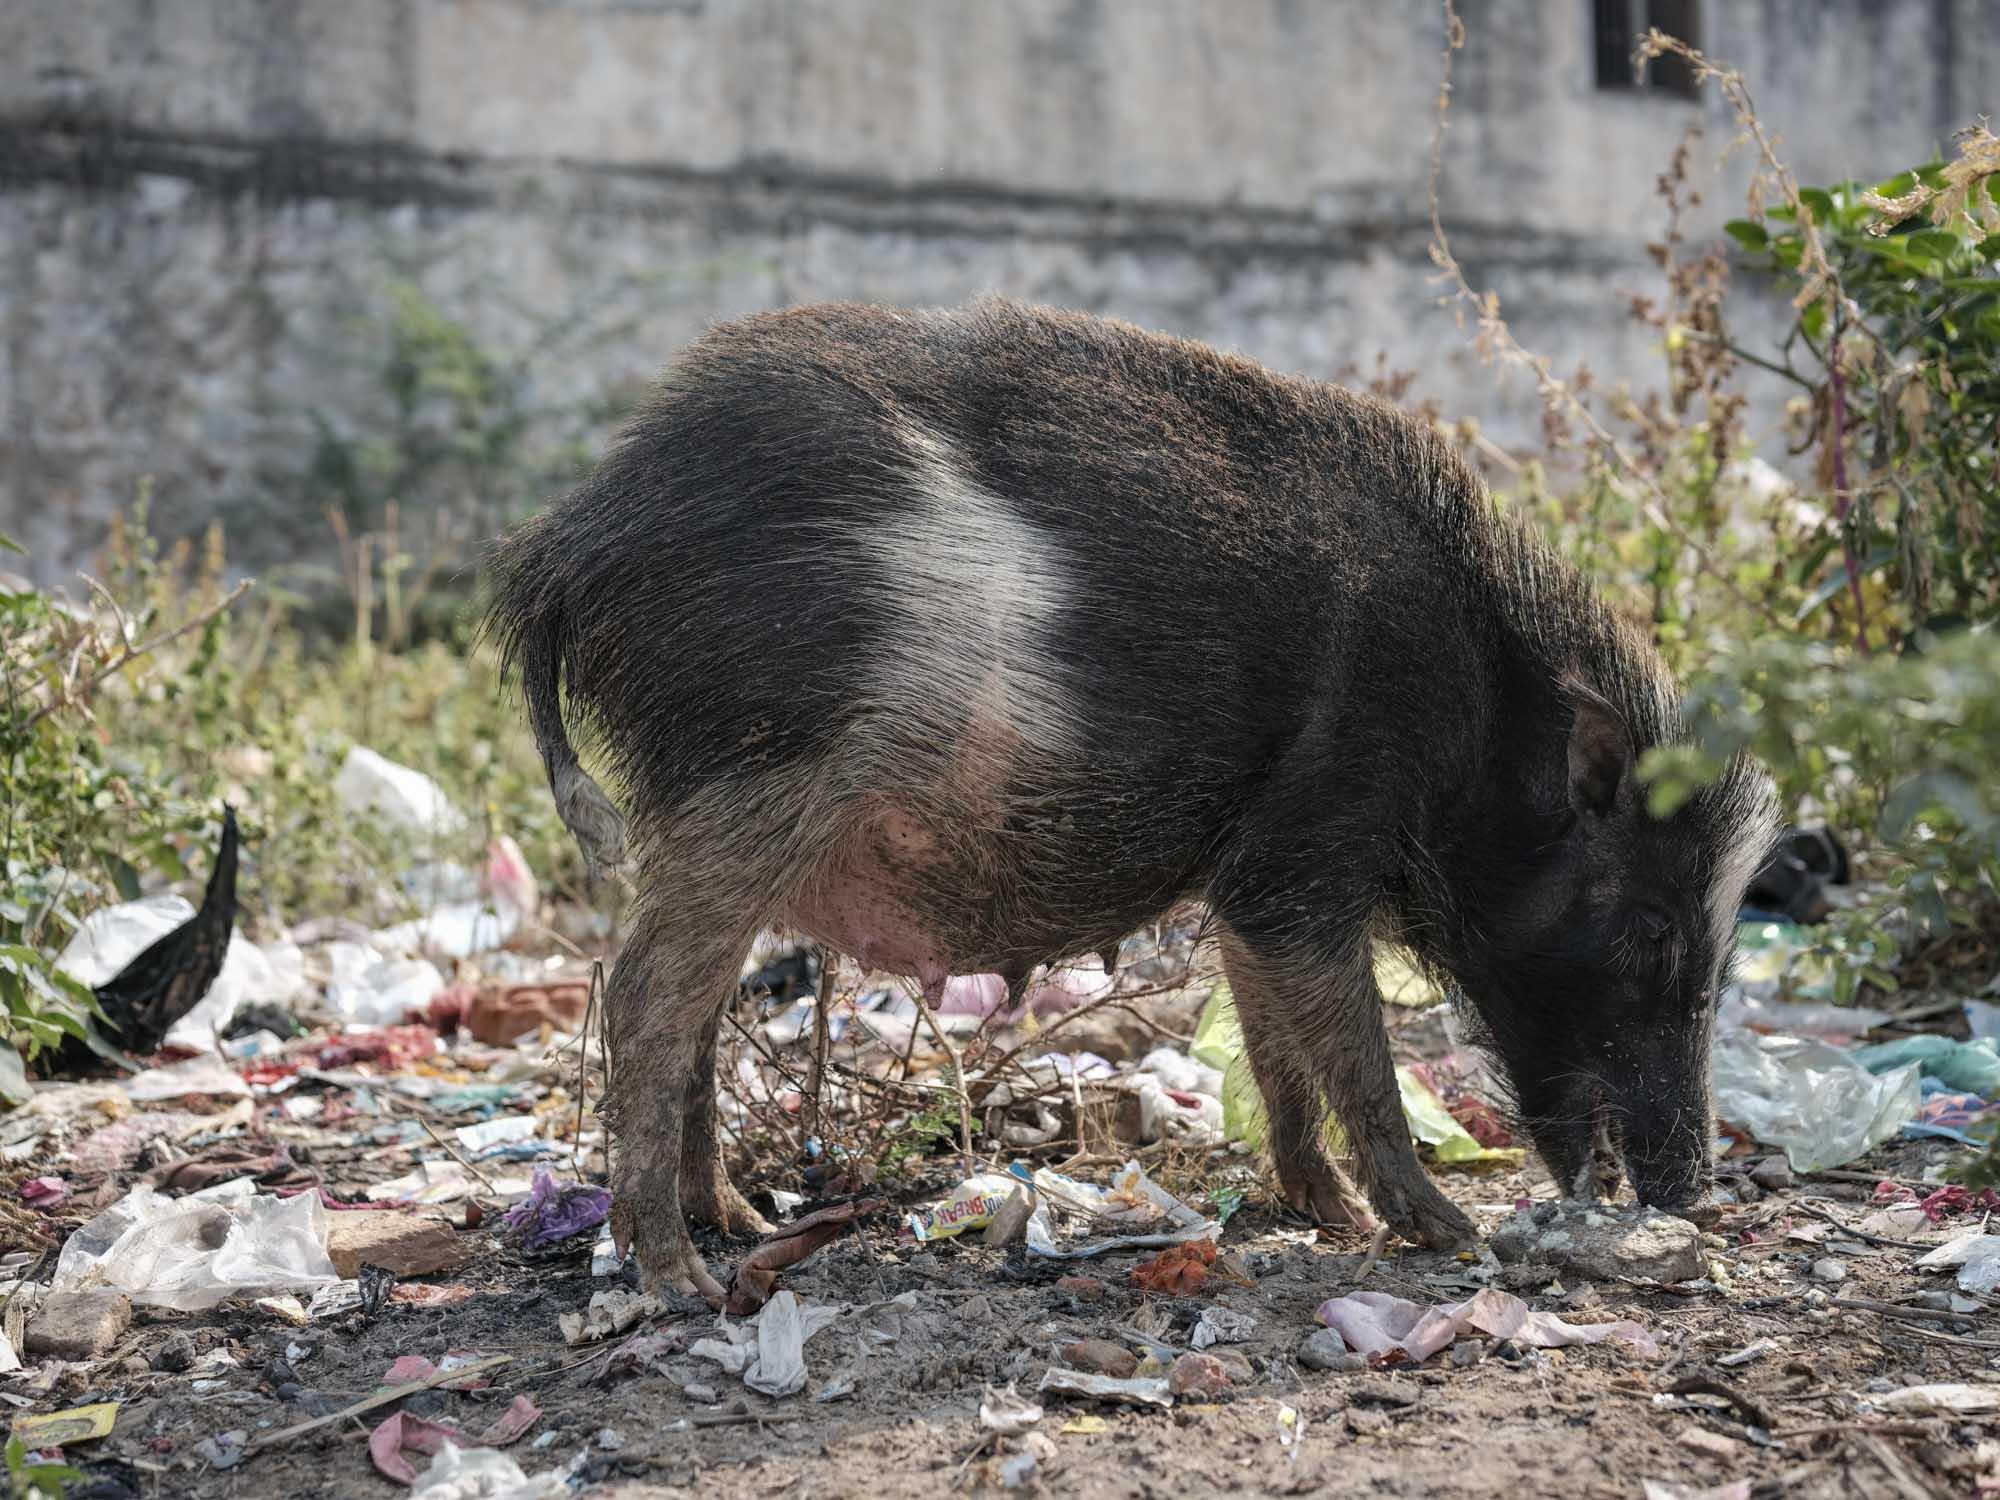 wild pig Gypsy Kalbelia tribe nomad Rajasthan India Documentary Photography Jose Jeuland Photographer print fine art